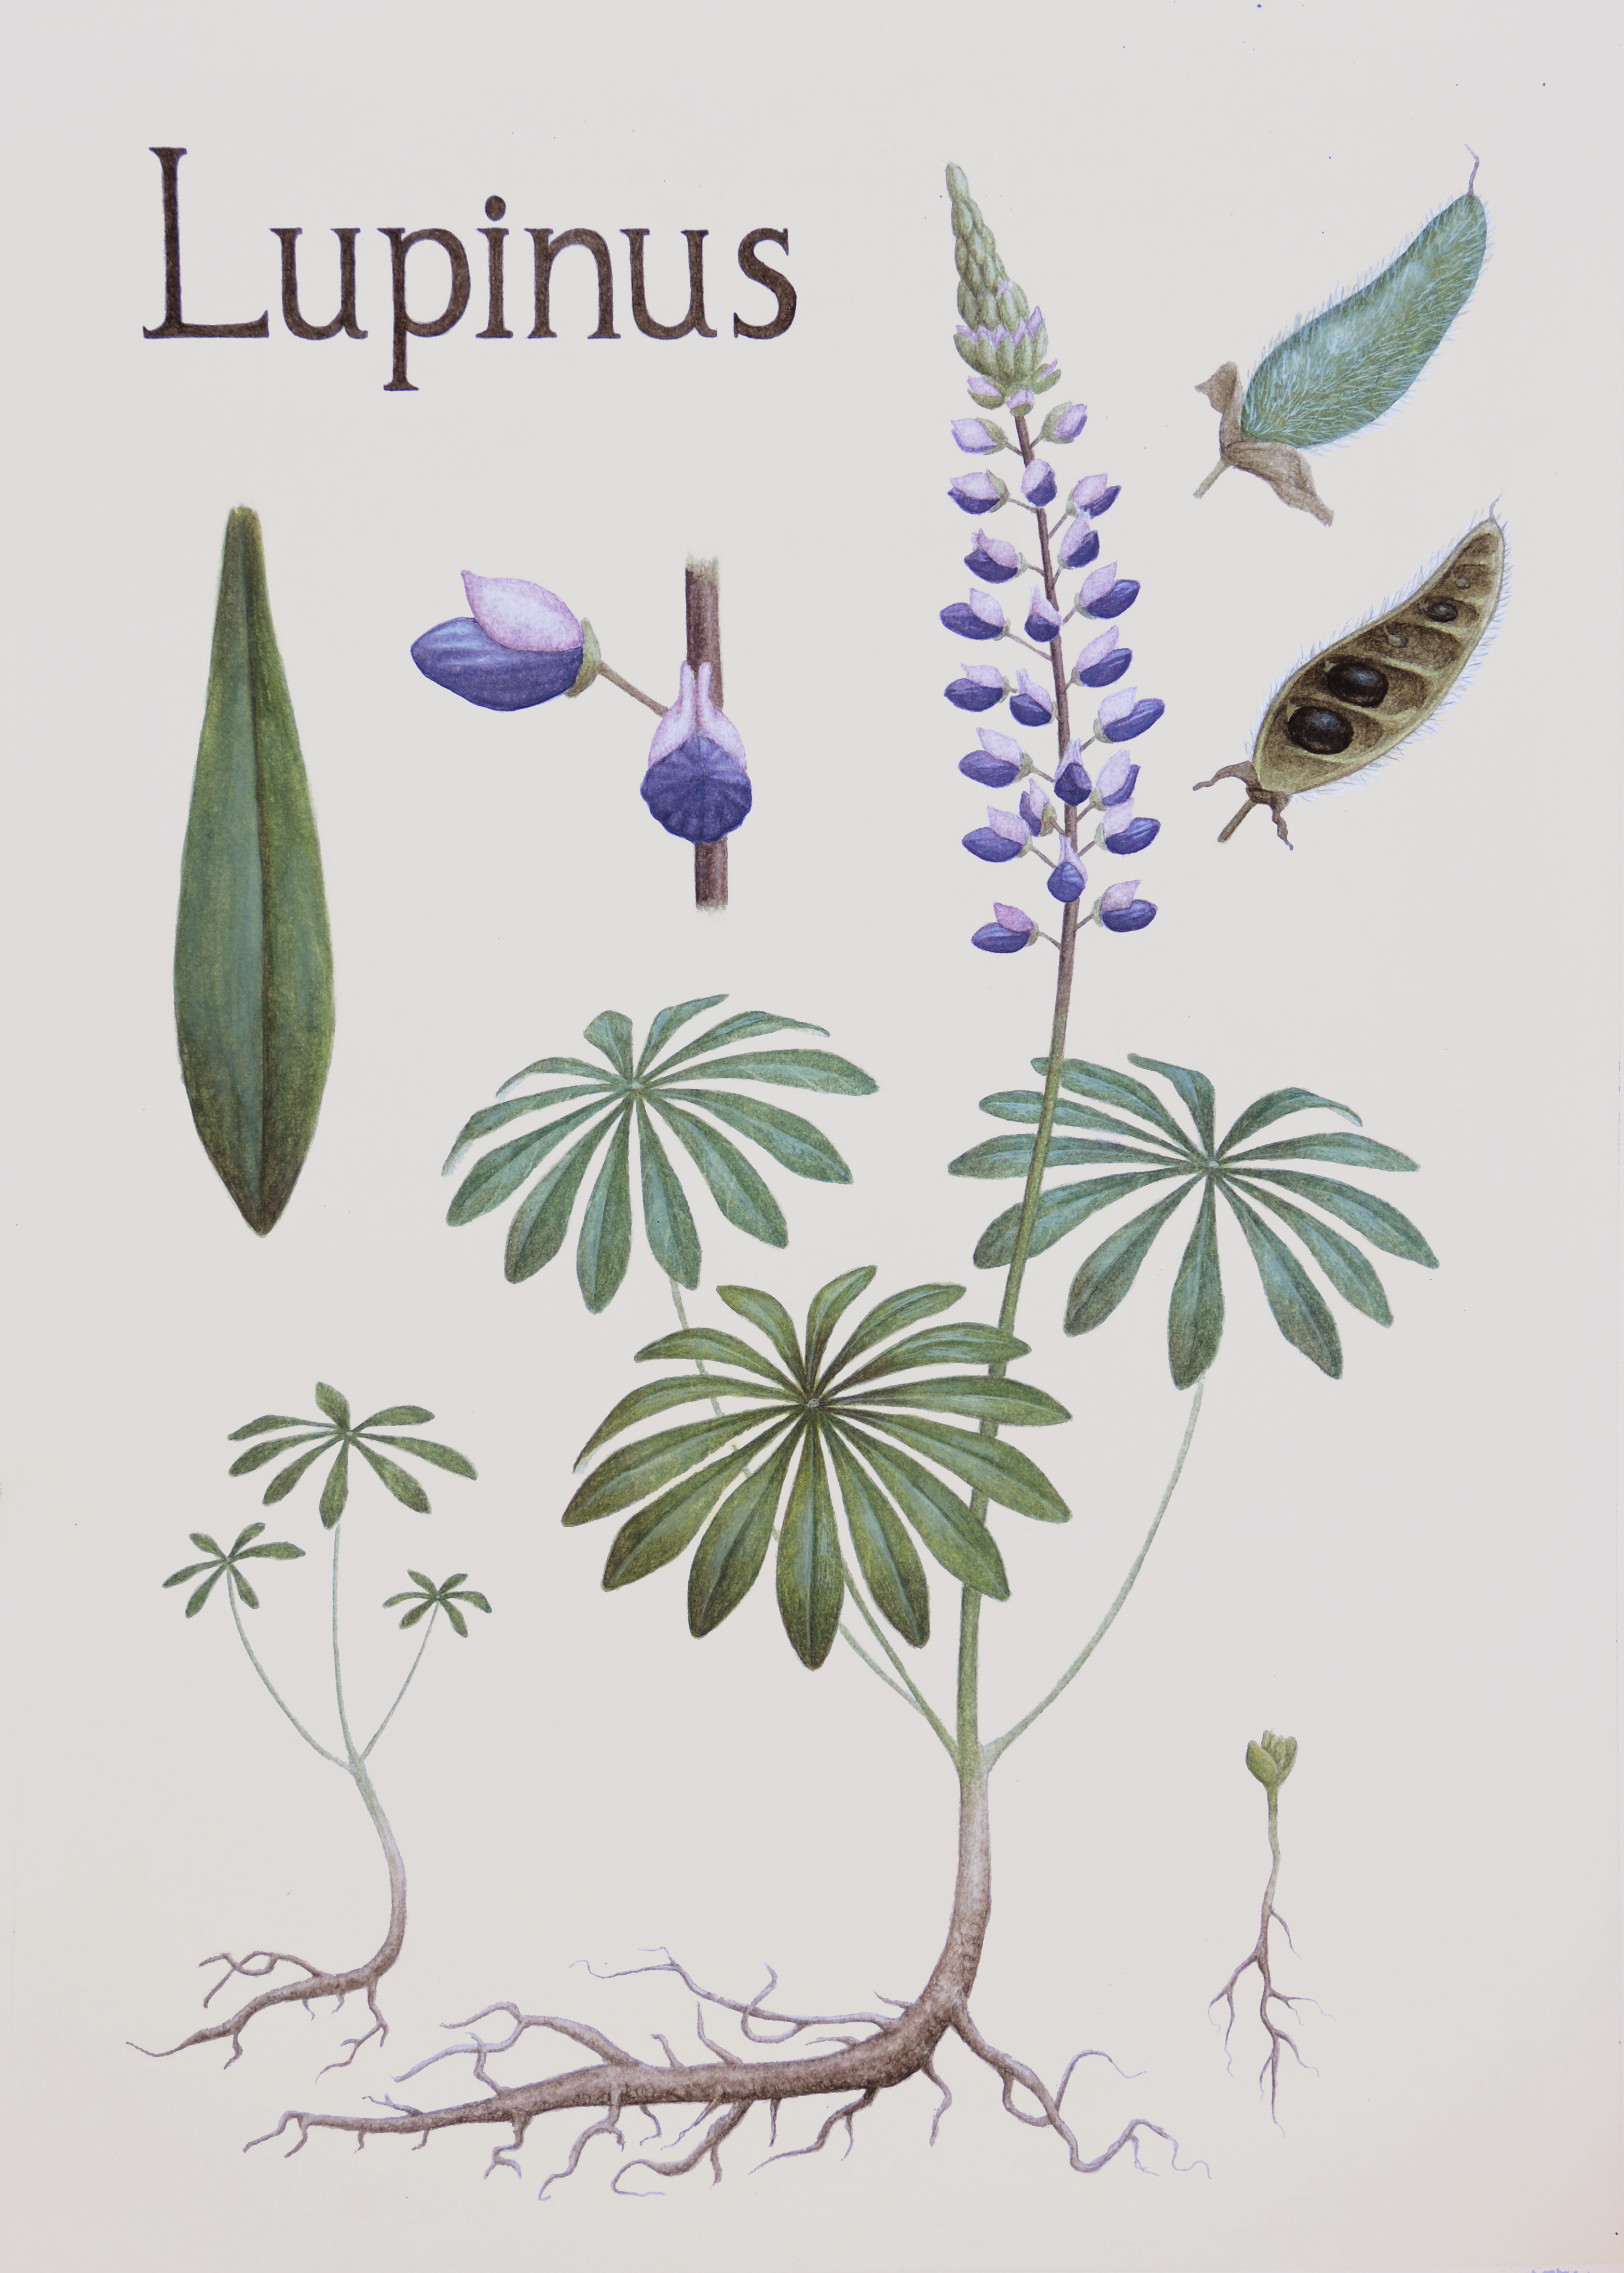 Lupine (Lupinus)